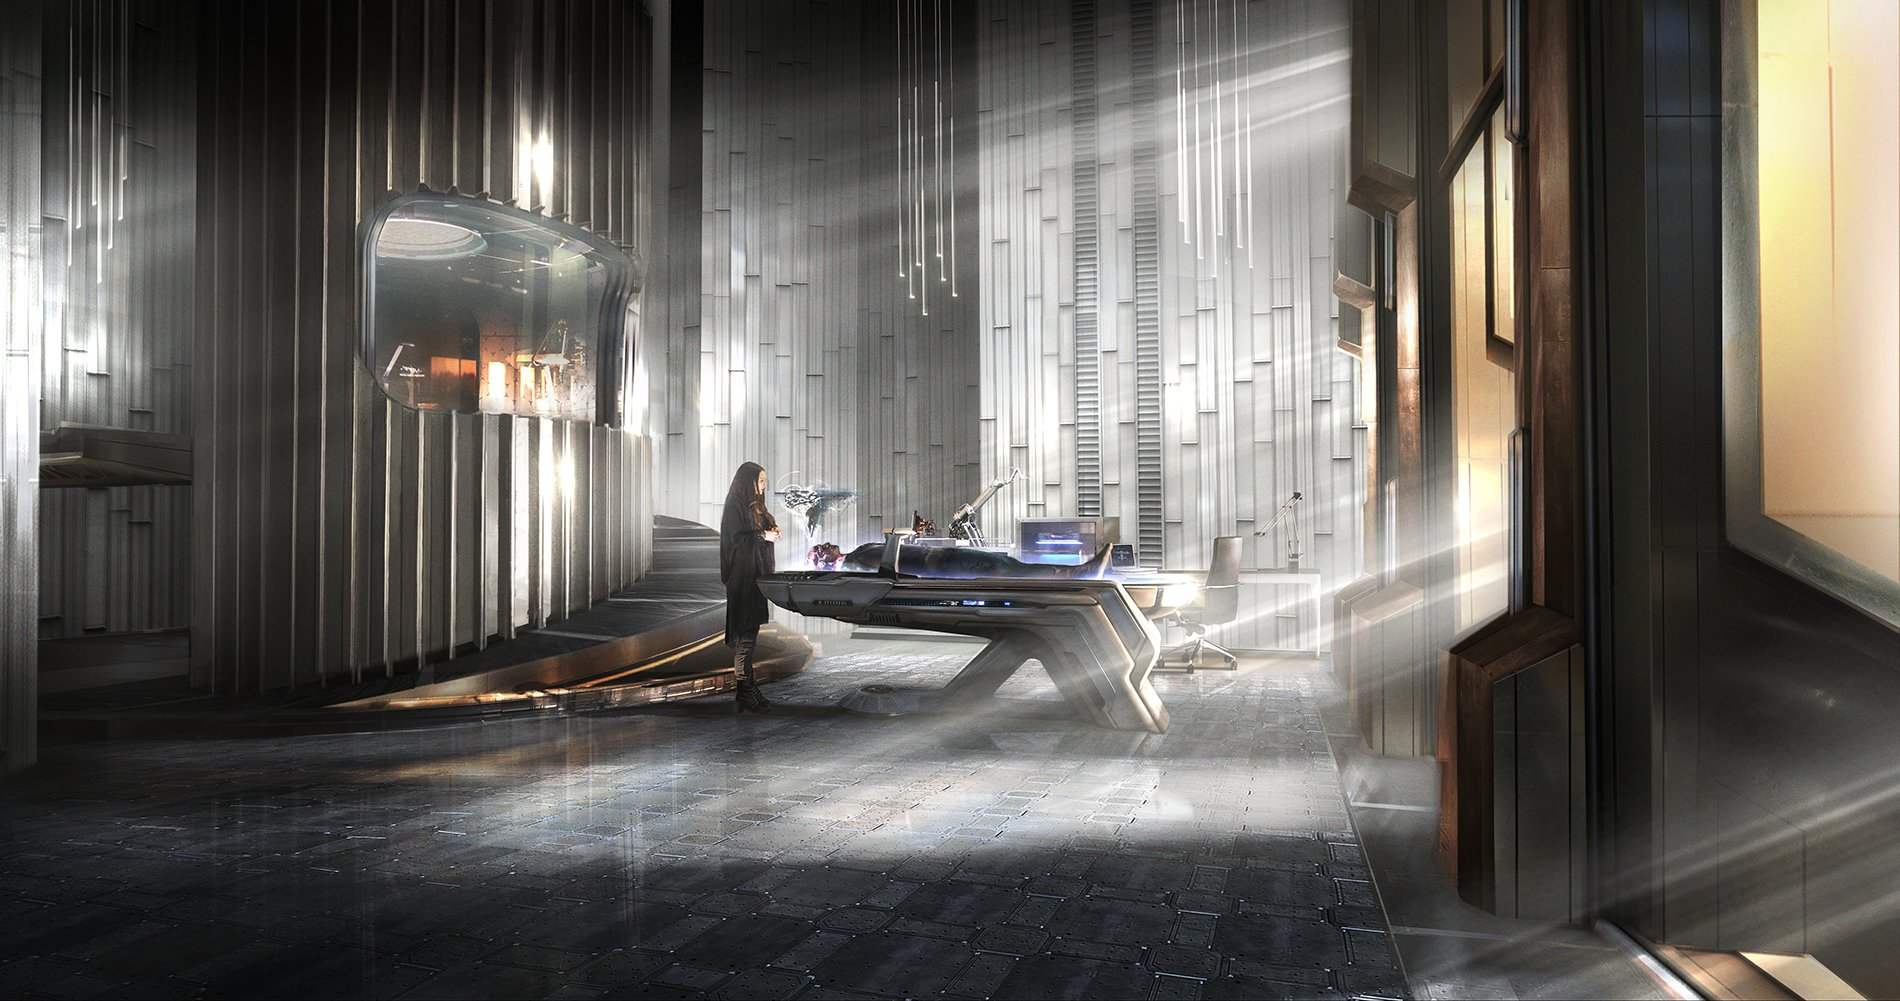 Концепт-арт Войны Бесконечности: Shuris Lab by Pete Thompson